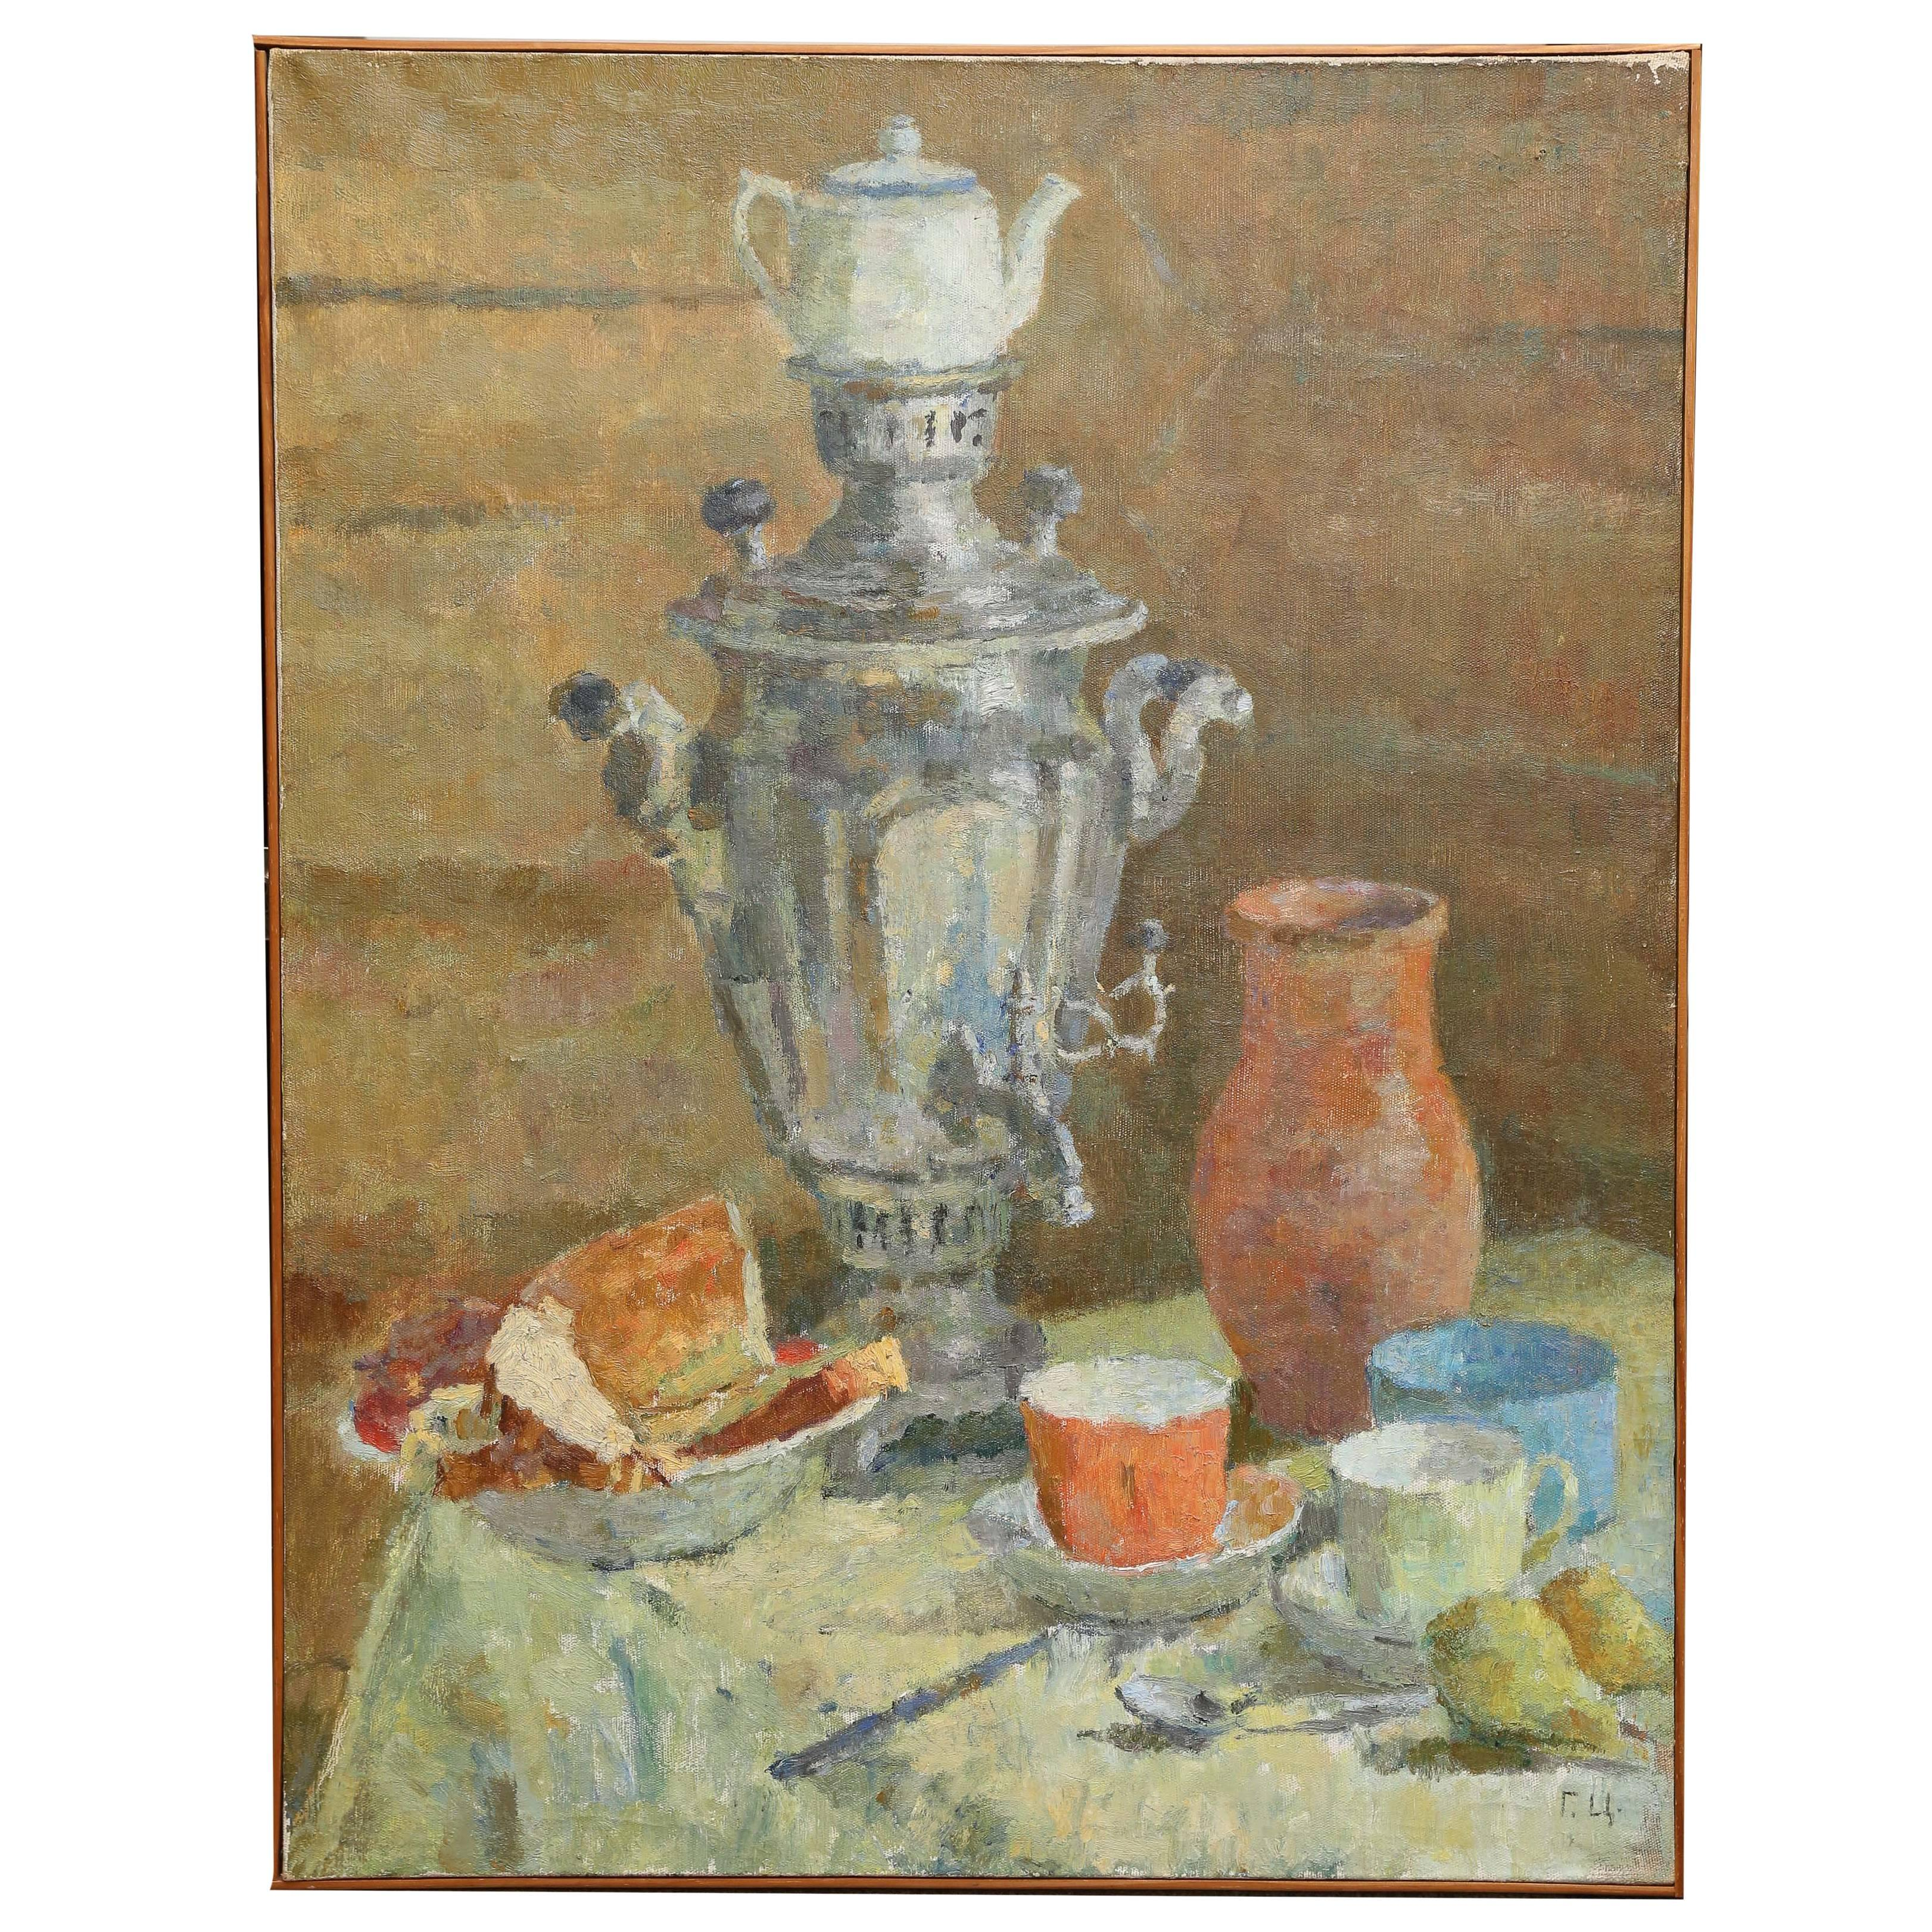 Painting in the Manner of Vladimir Yatsenko, Russian/Soviet Artist